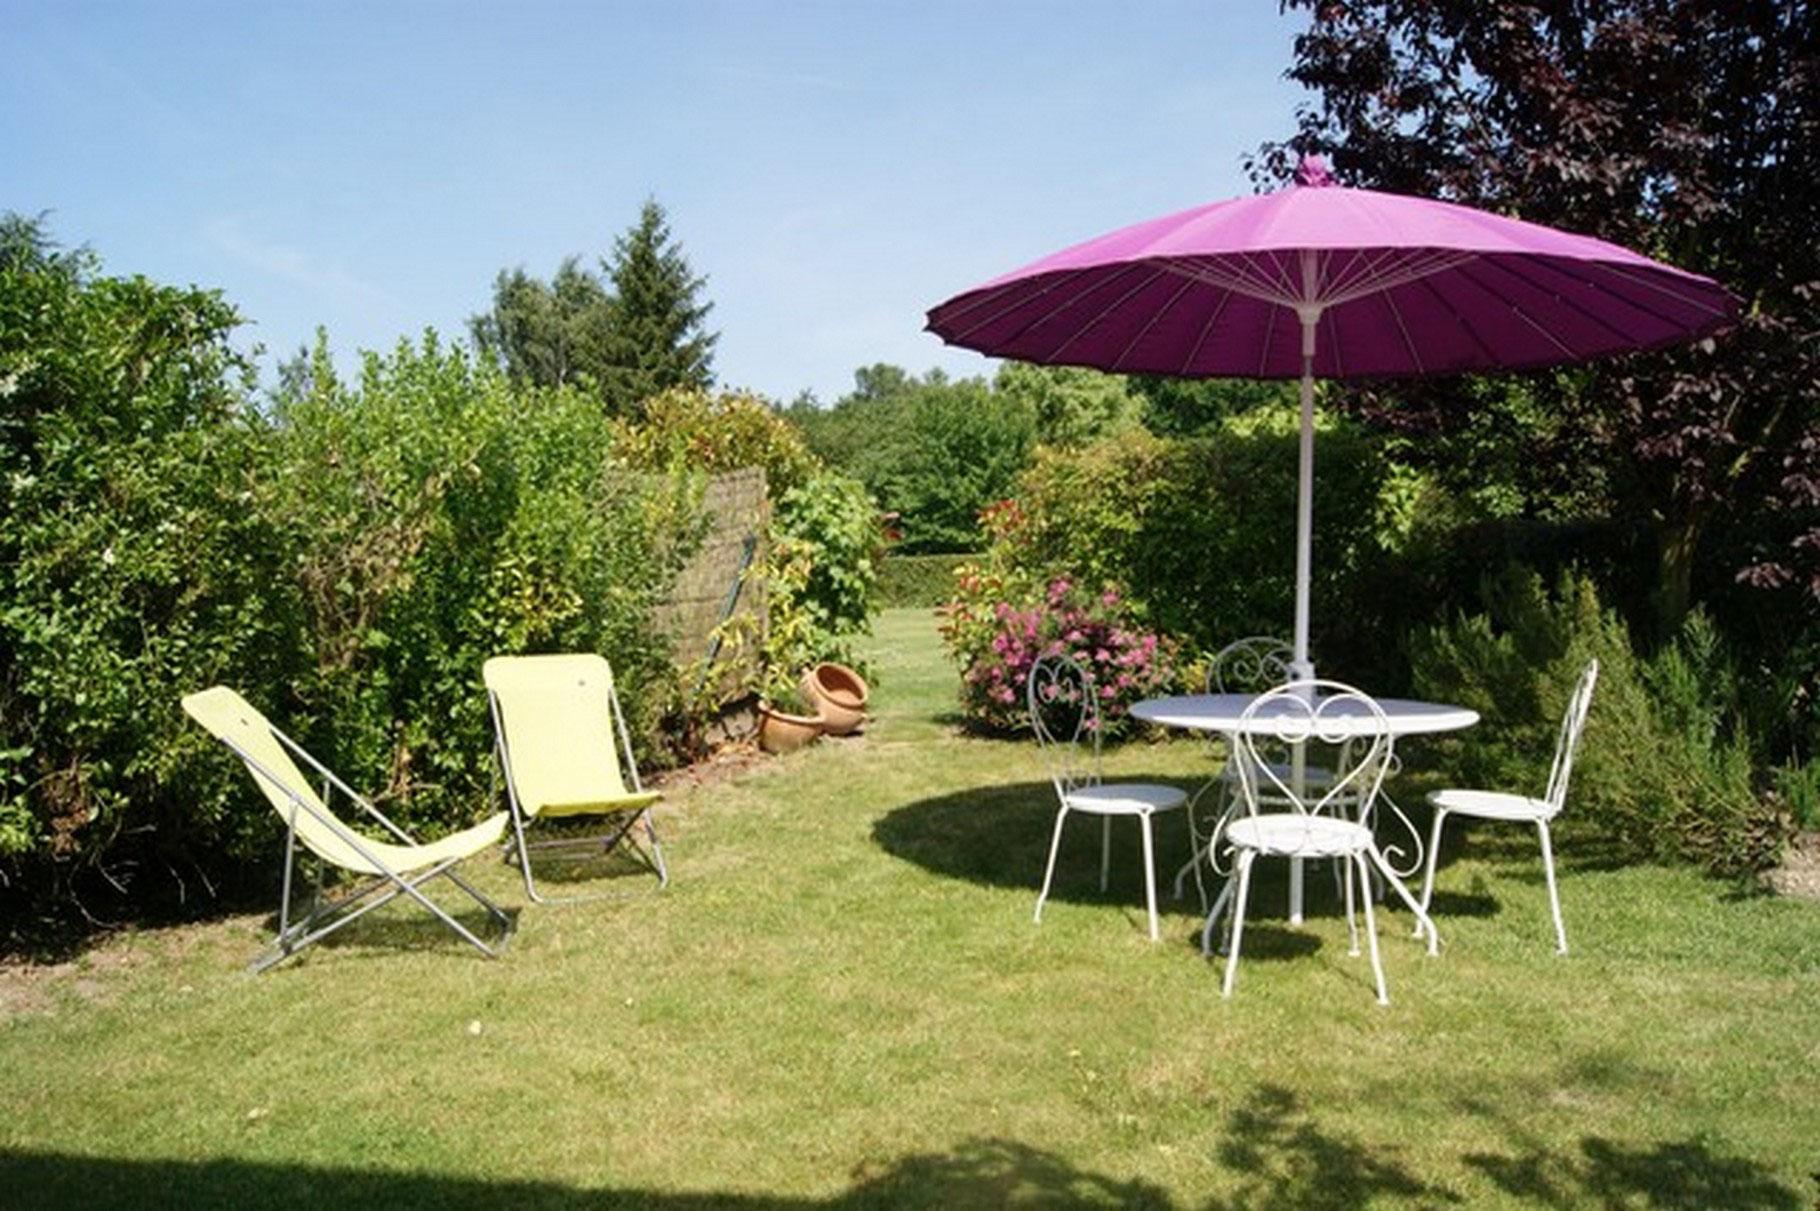 Gite senlis chantilly asterix north paris near a1 chambre d 39 hotes gite senlis - Chambre d hotes parc asterix ...